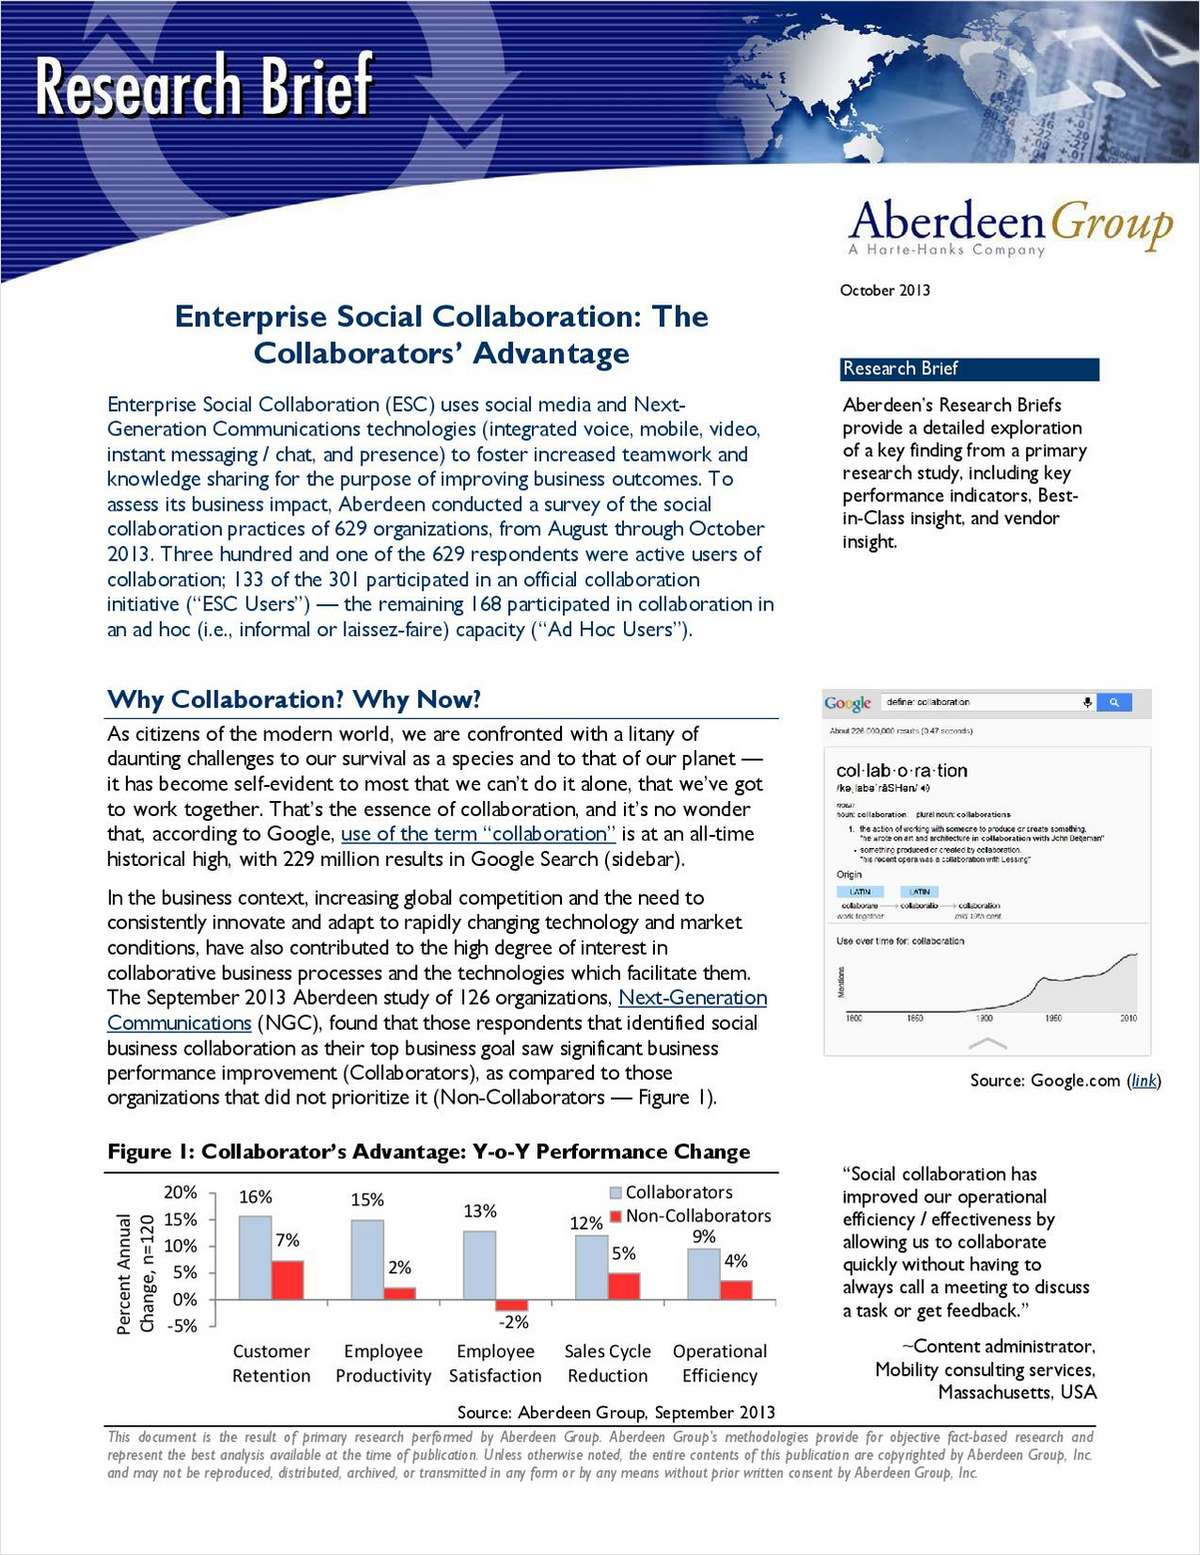 Enterprise Social Collaboration: The Collaborators' Advantage